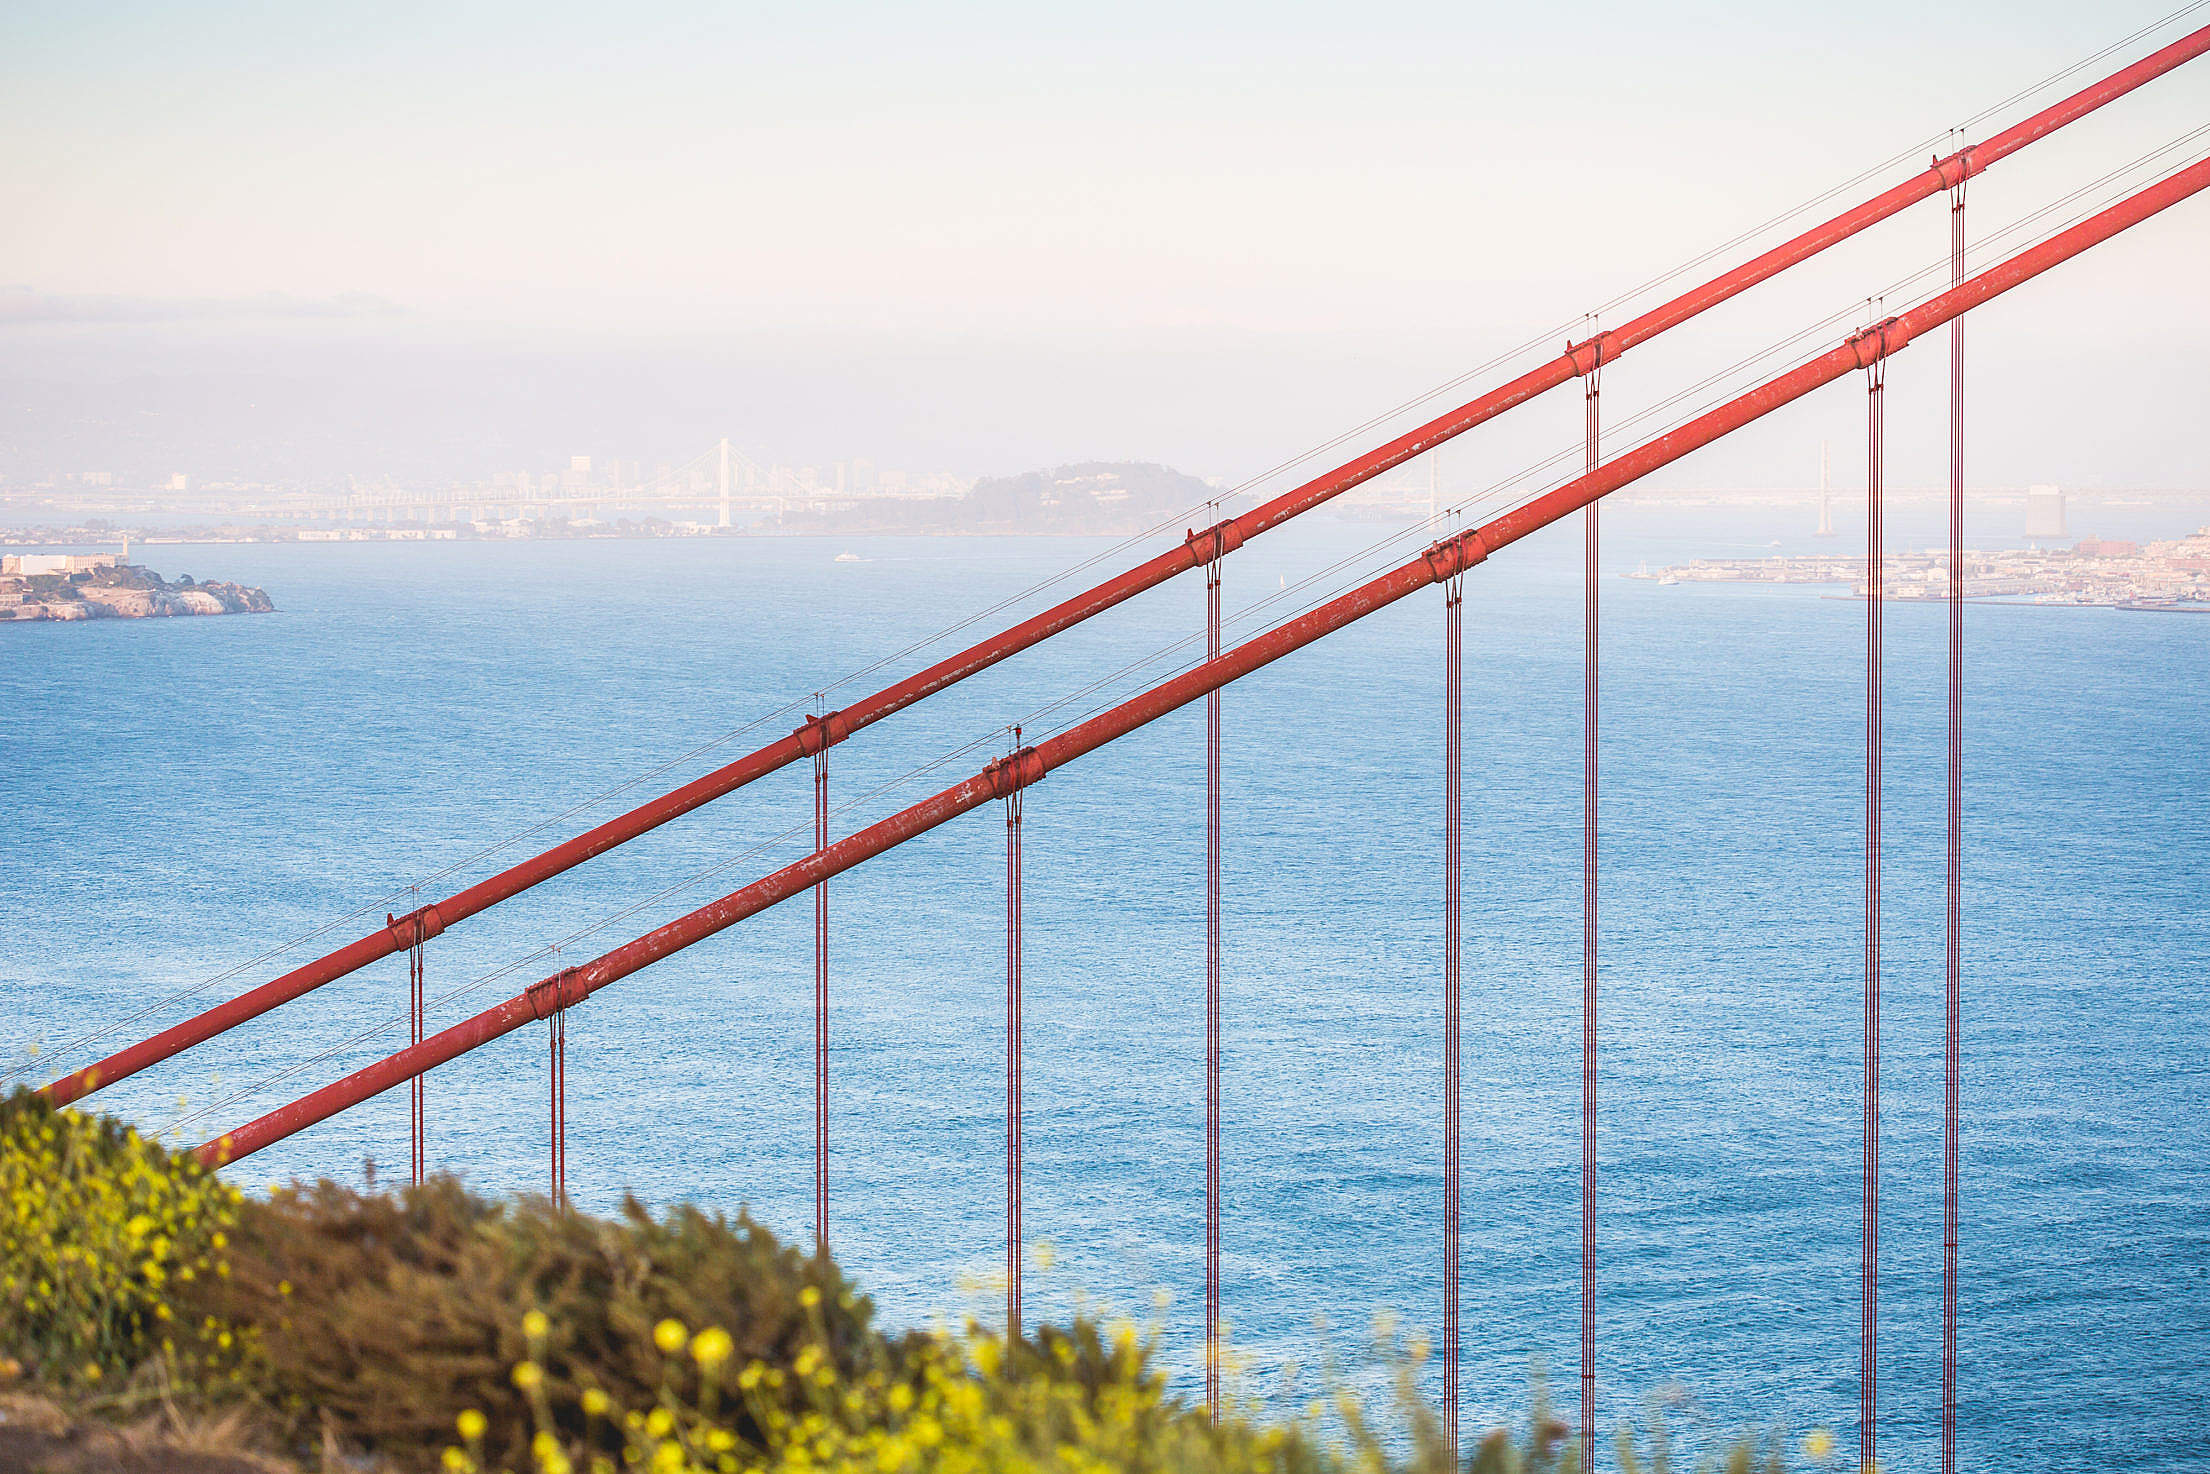 Golden Gate Bridge Suspension Cables Free Stock Photo